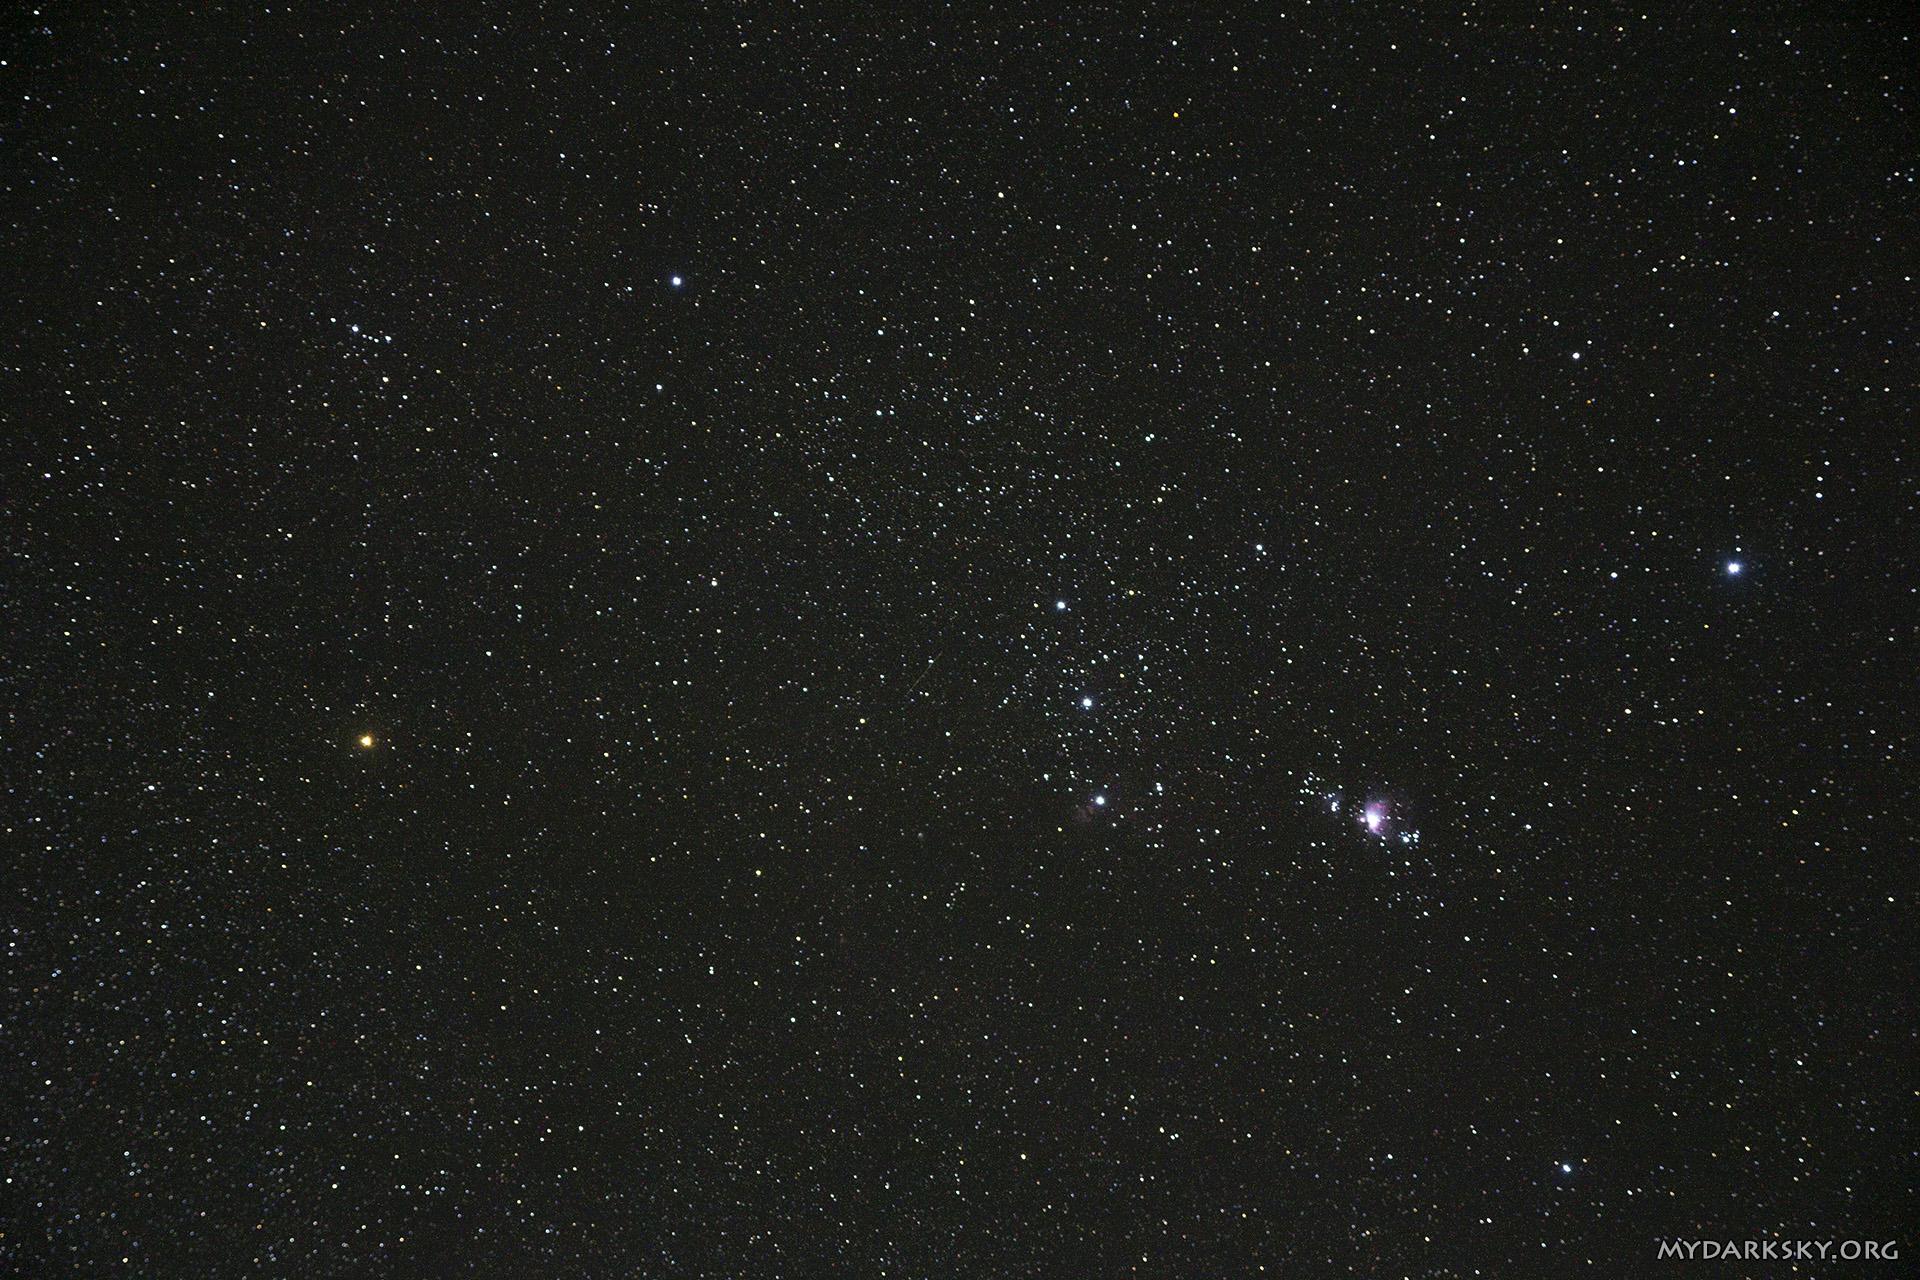 Black Aesthetic Wallpaper My Dark Sky Lifelong Companion Under The Stars